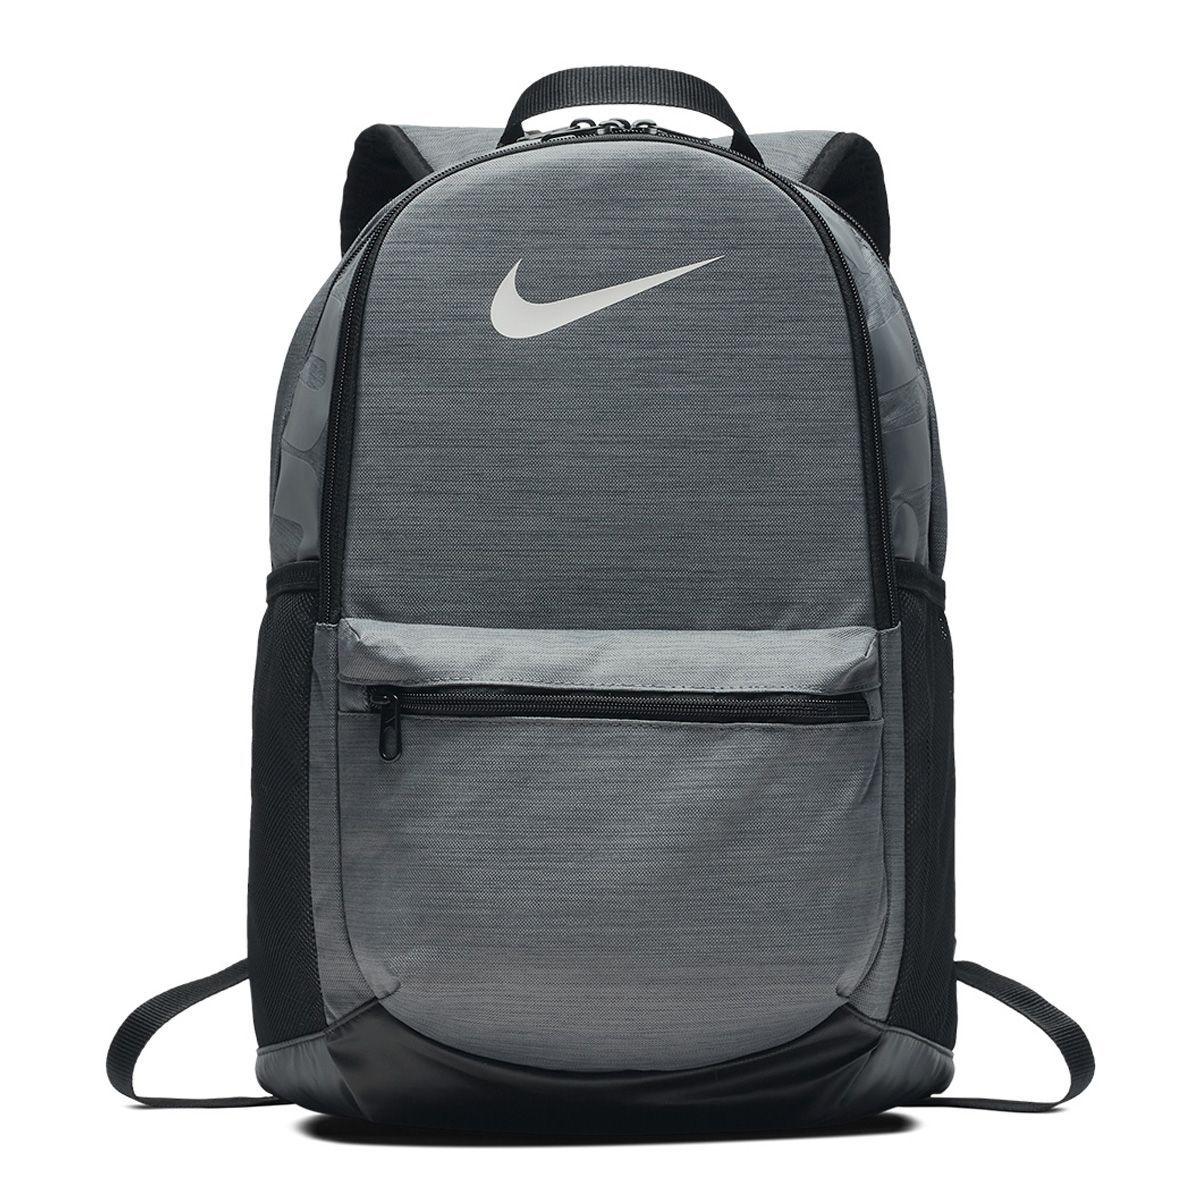 Habitar Adolescente Geografía  Mochila Nike Brasilia Just do It Notebook Cinza Grafite Original | Bolsa  Masculina Nike Nunca Usado 39728215 | enjoei